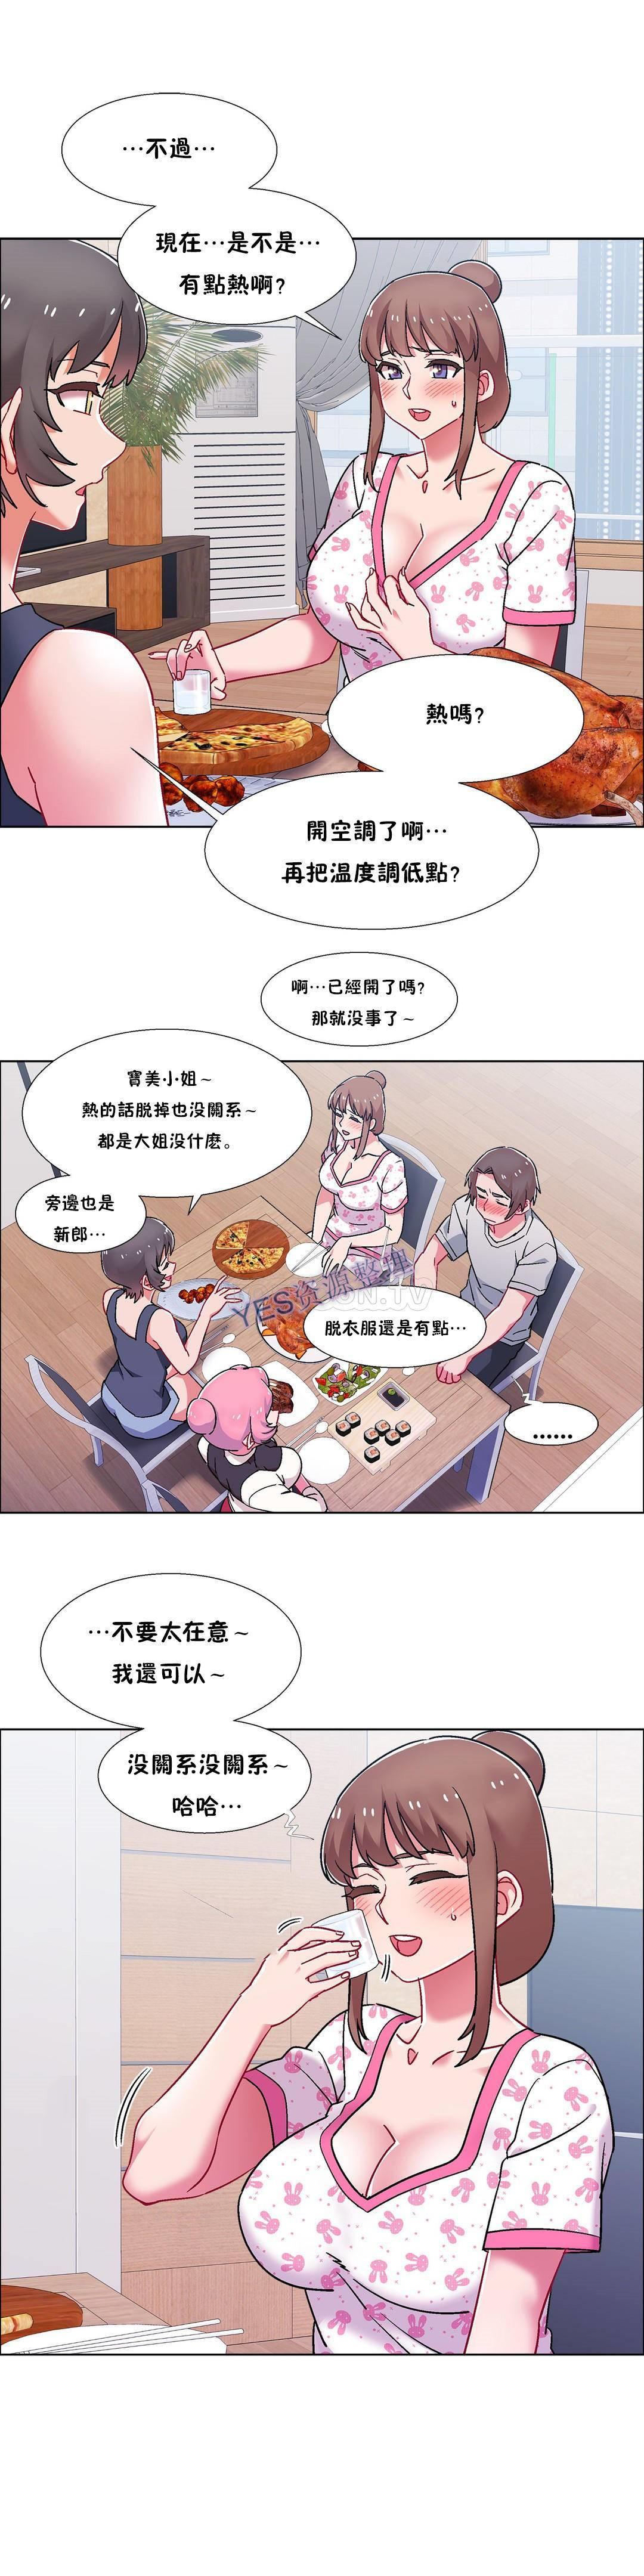 [Studio Wannabe] Rental Girls | 出租女郎 Ch. 33-58 [Chinese]  第二季 完结 537